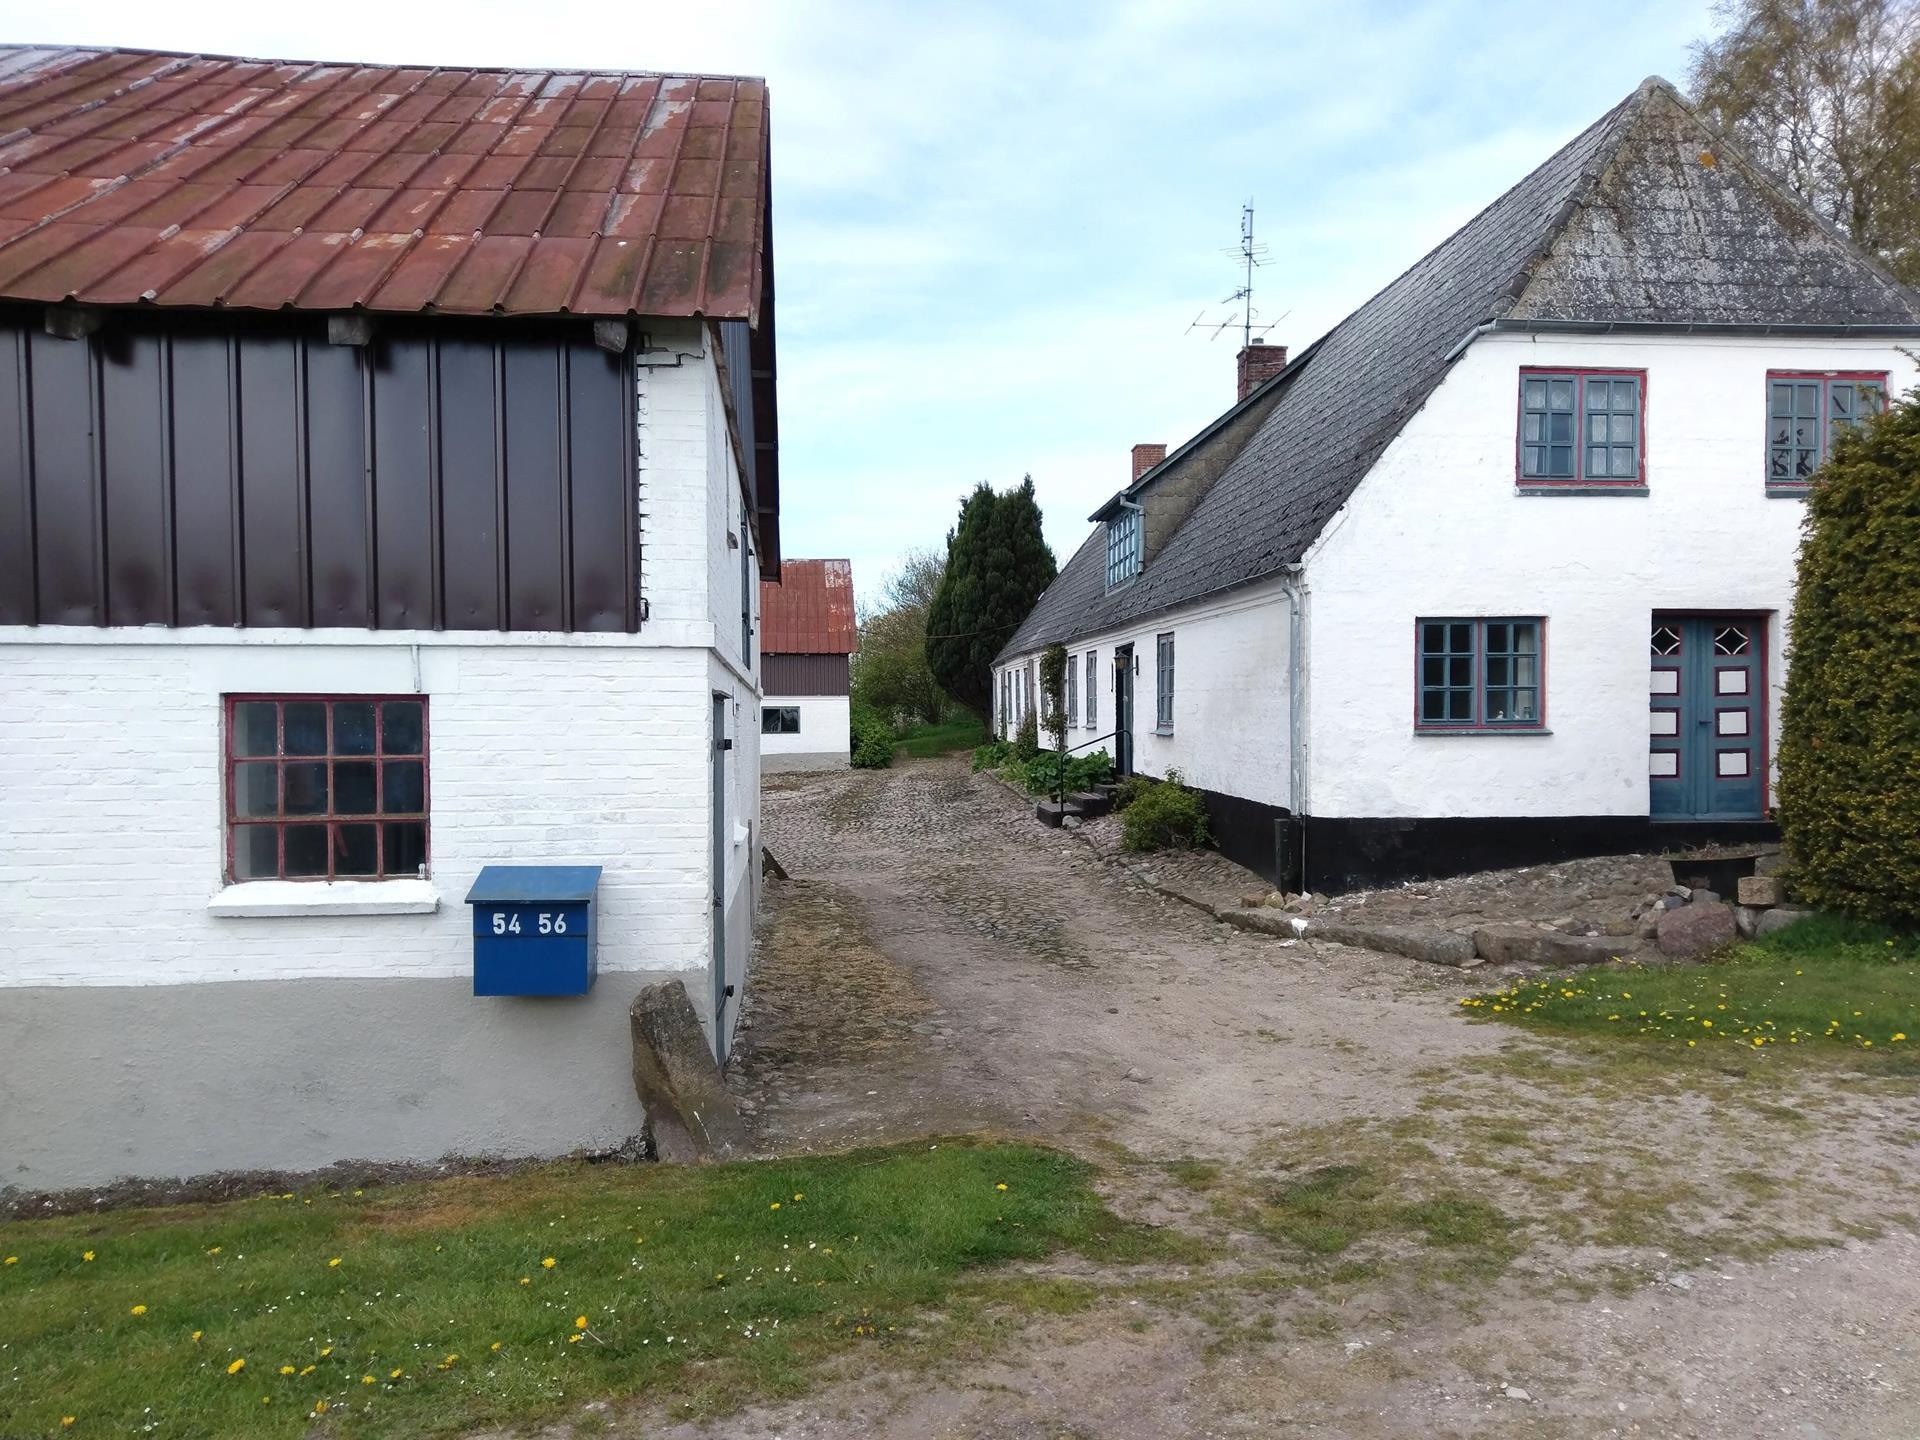 Planteavlsgård på Barsø Bygade i Barsø - Andet